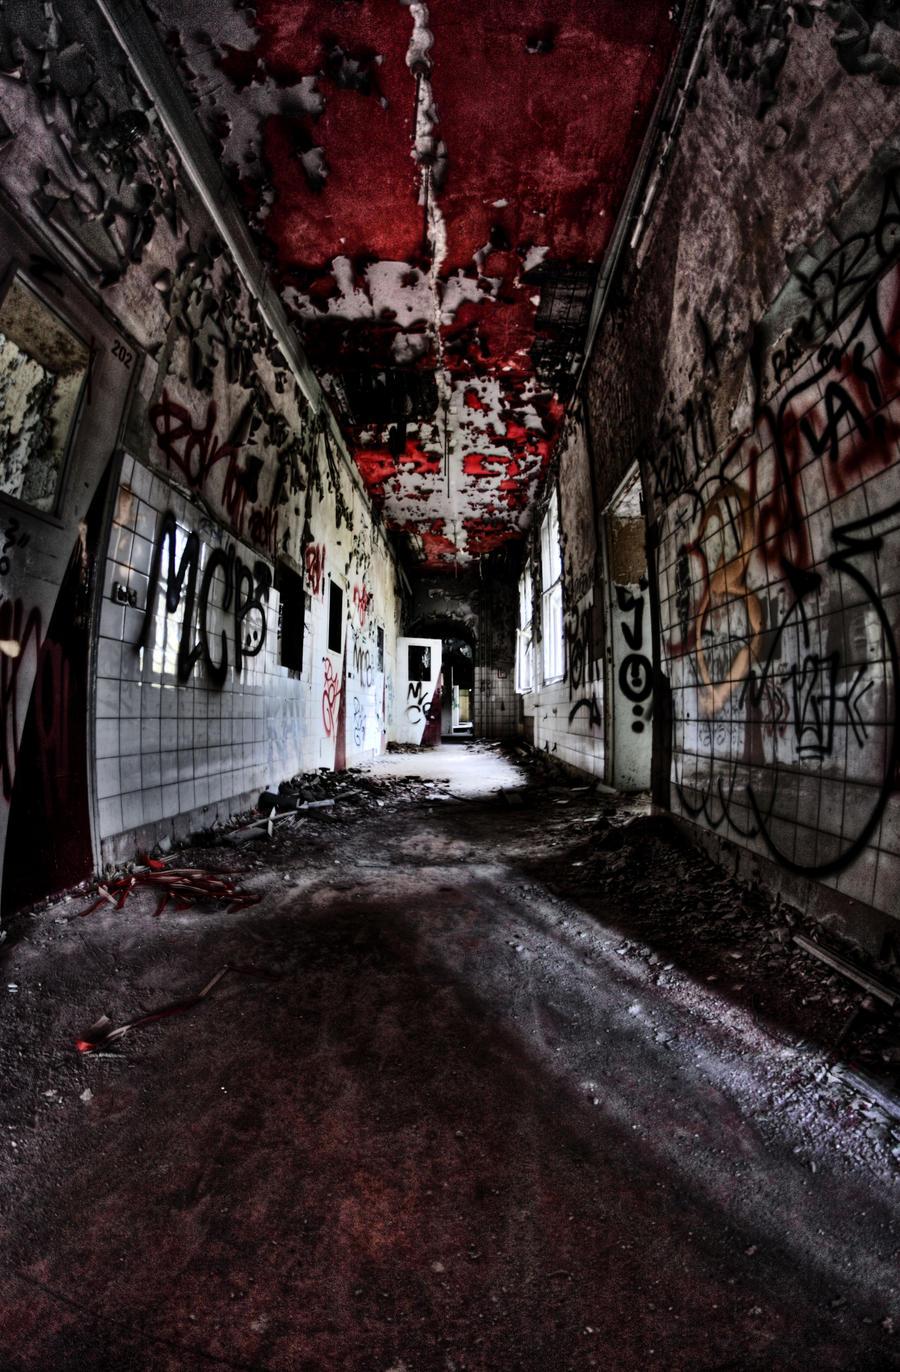 Kinderkrankenhaus 2 by Skanatiker